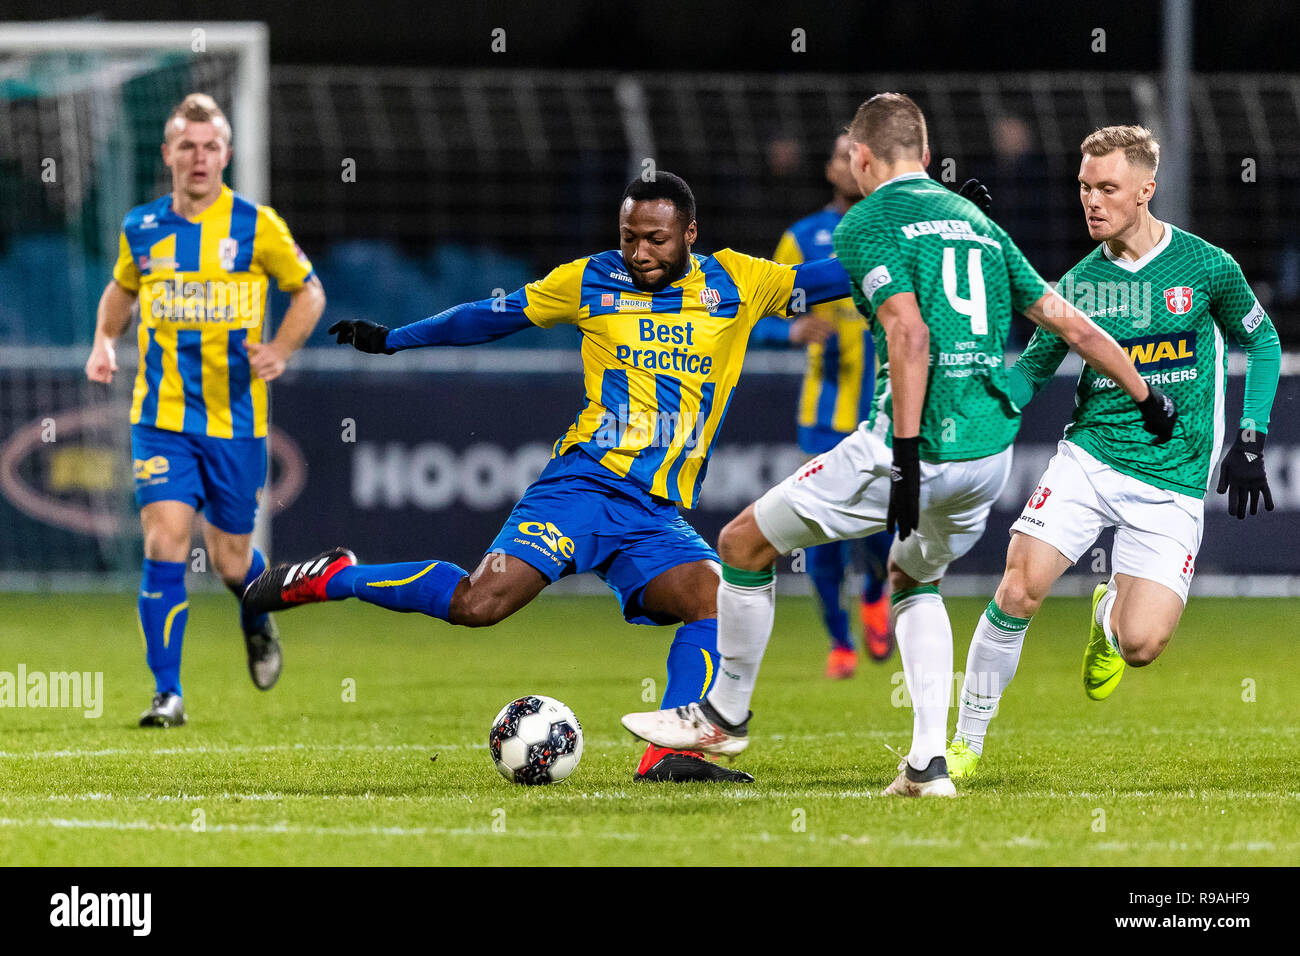 Keuken Kampioen Dordrecht : Dordrecht niederlande fußball stadion